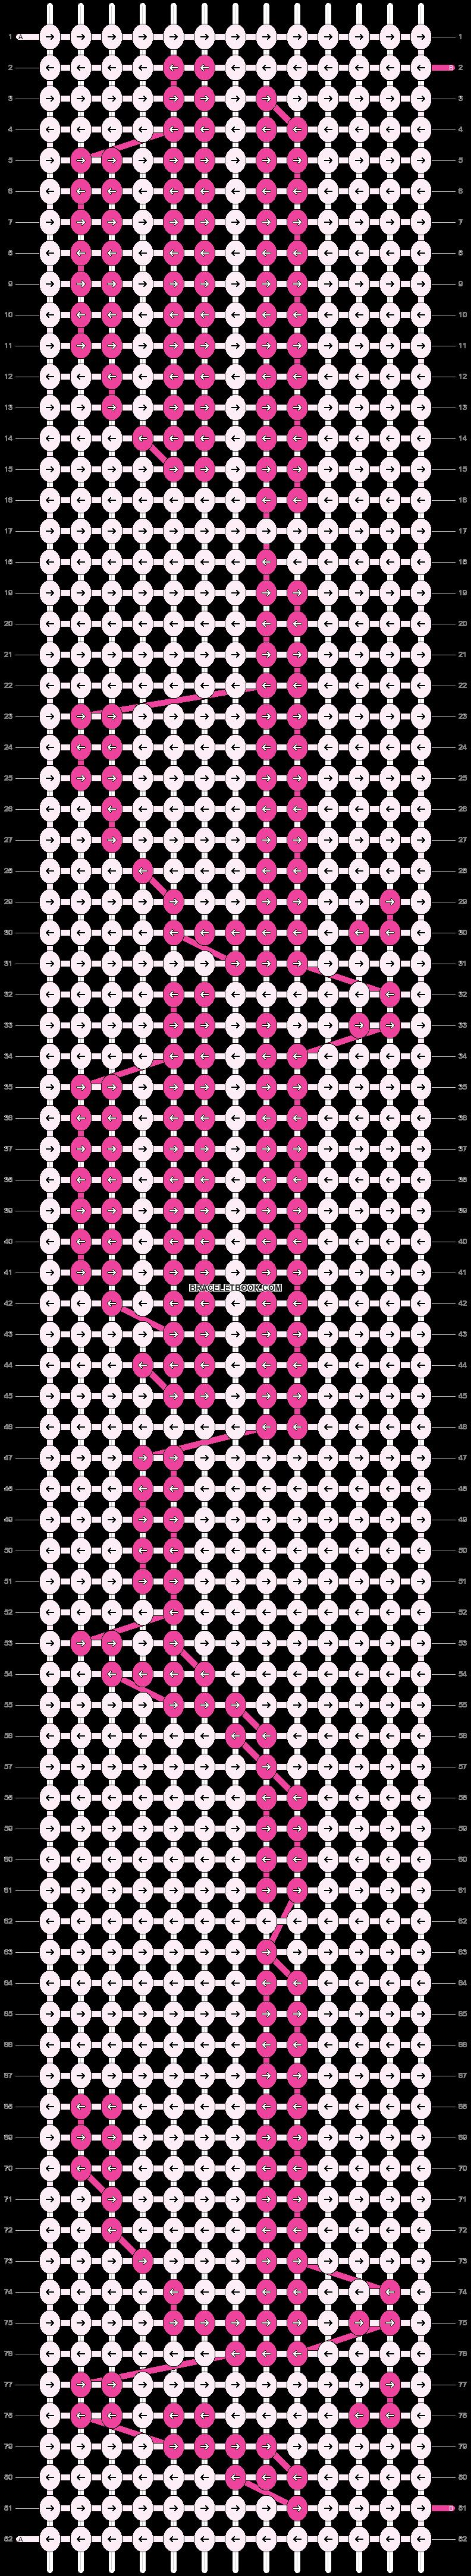 Alpha pattern #17171 pattern